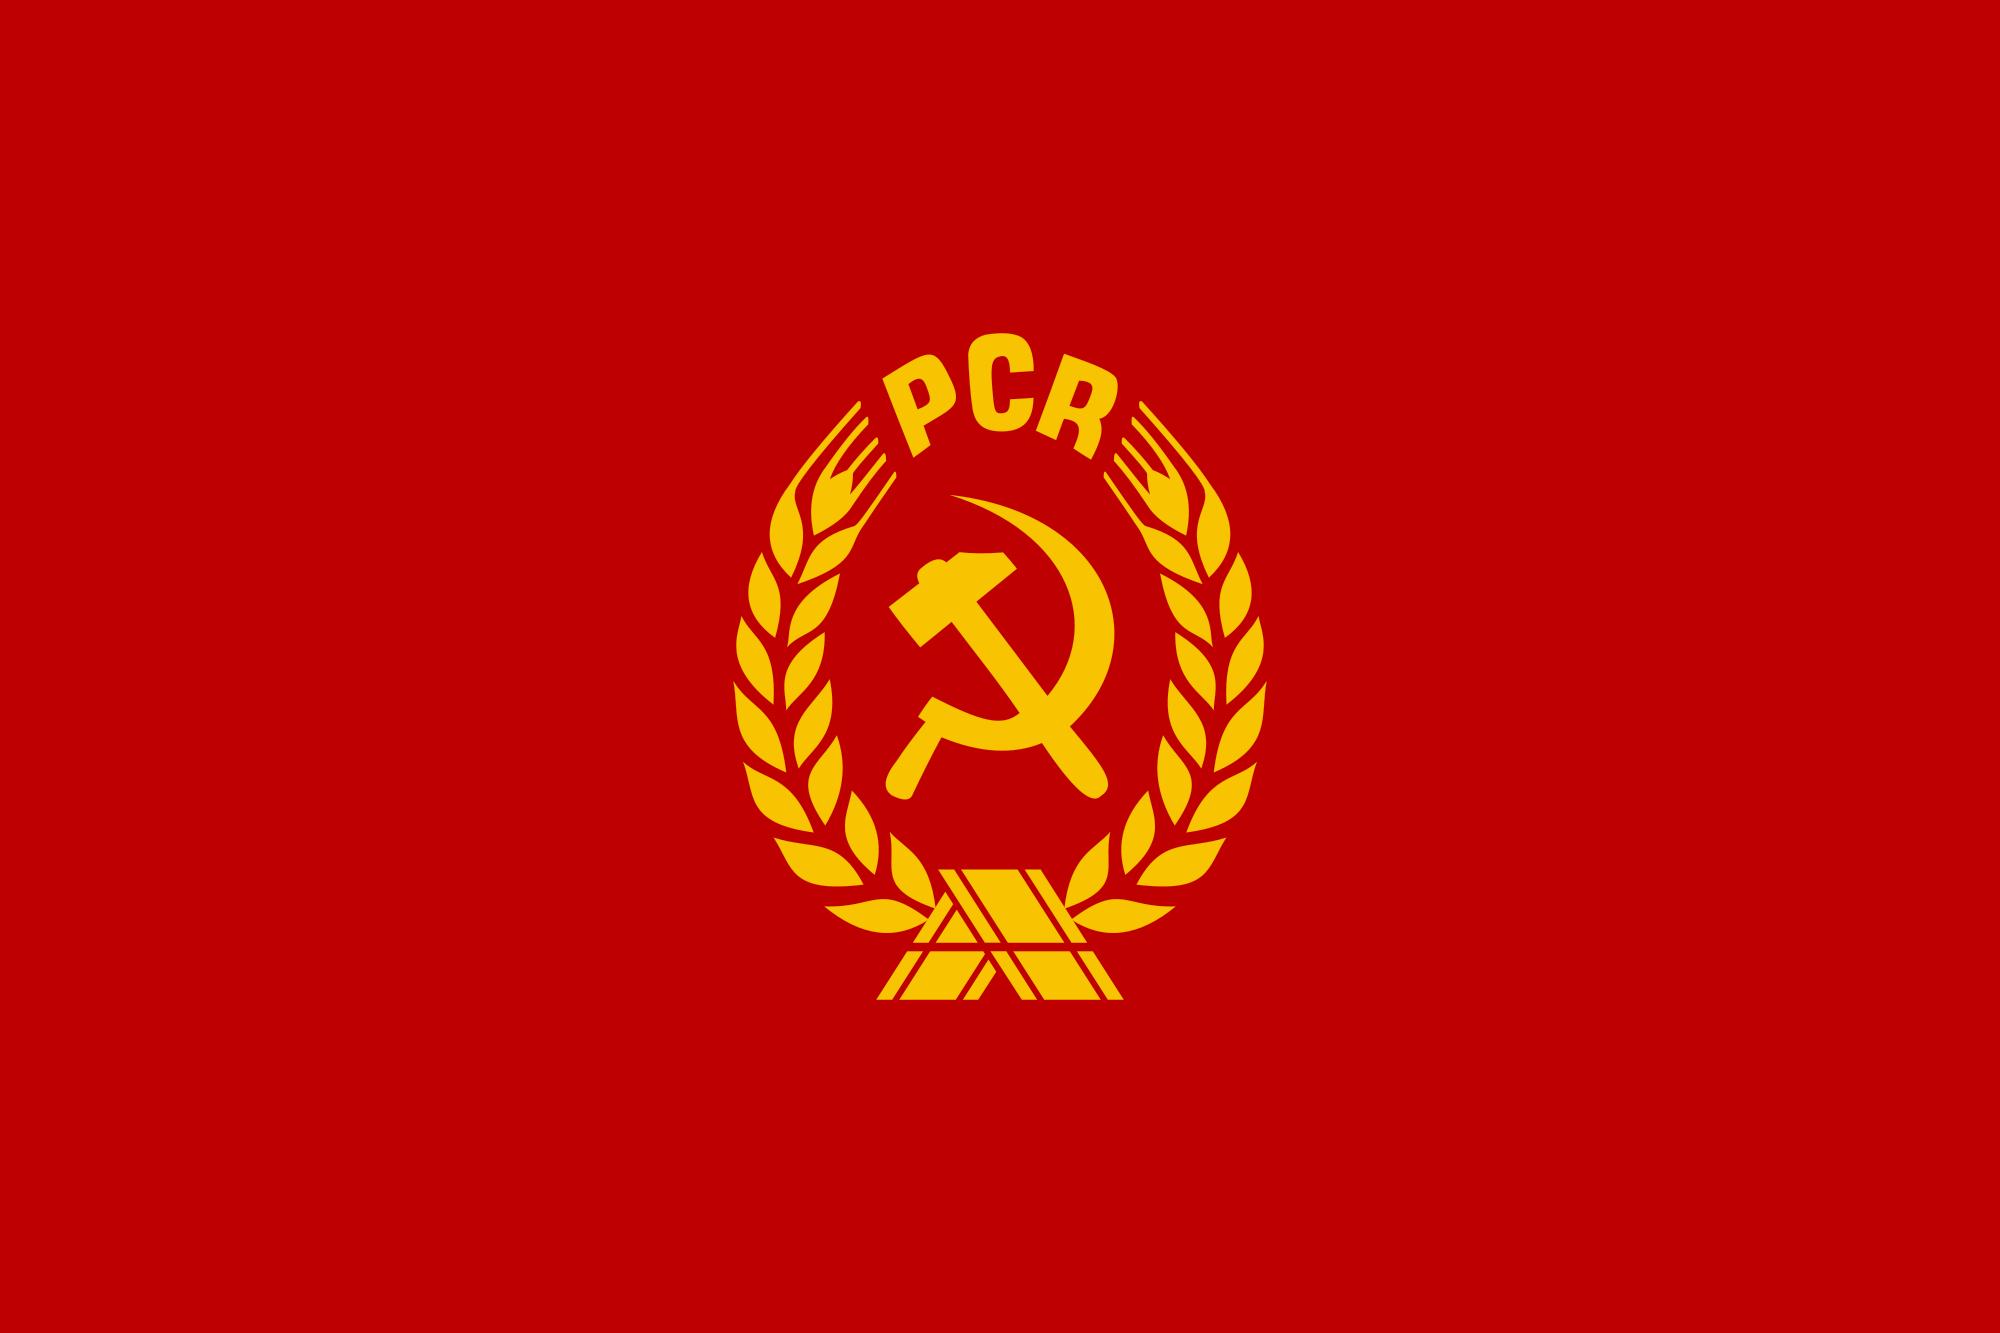 Partidul Comunist Român (Wikimedia Commons)